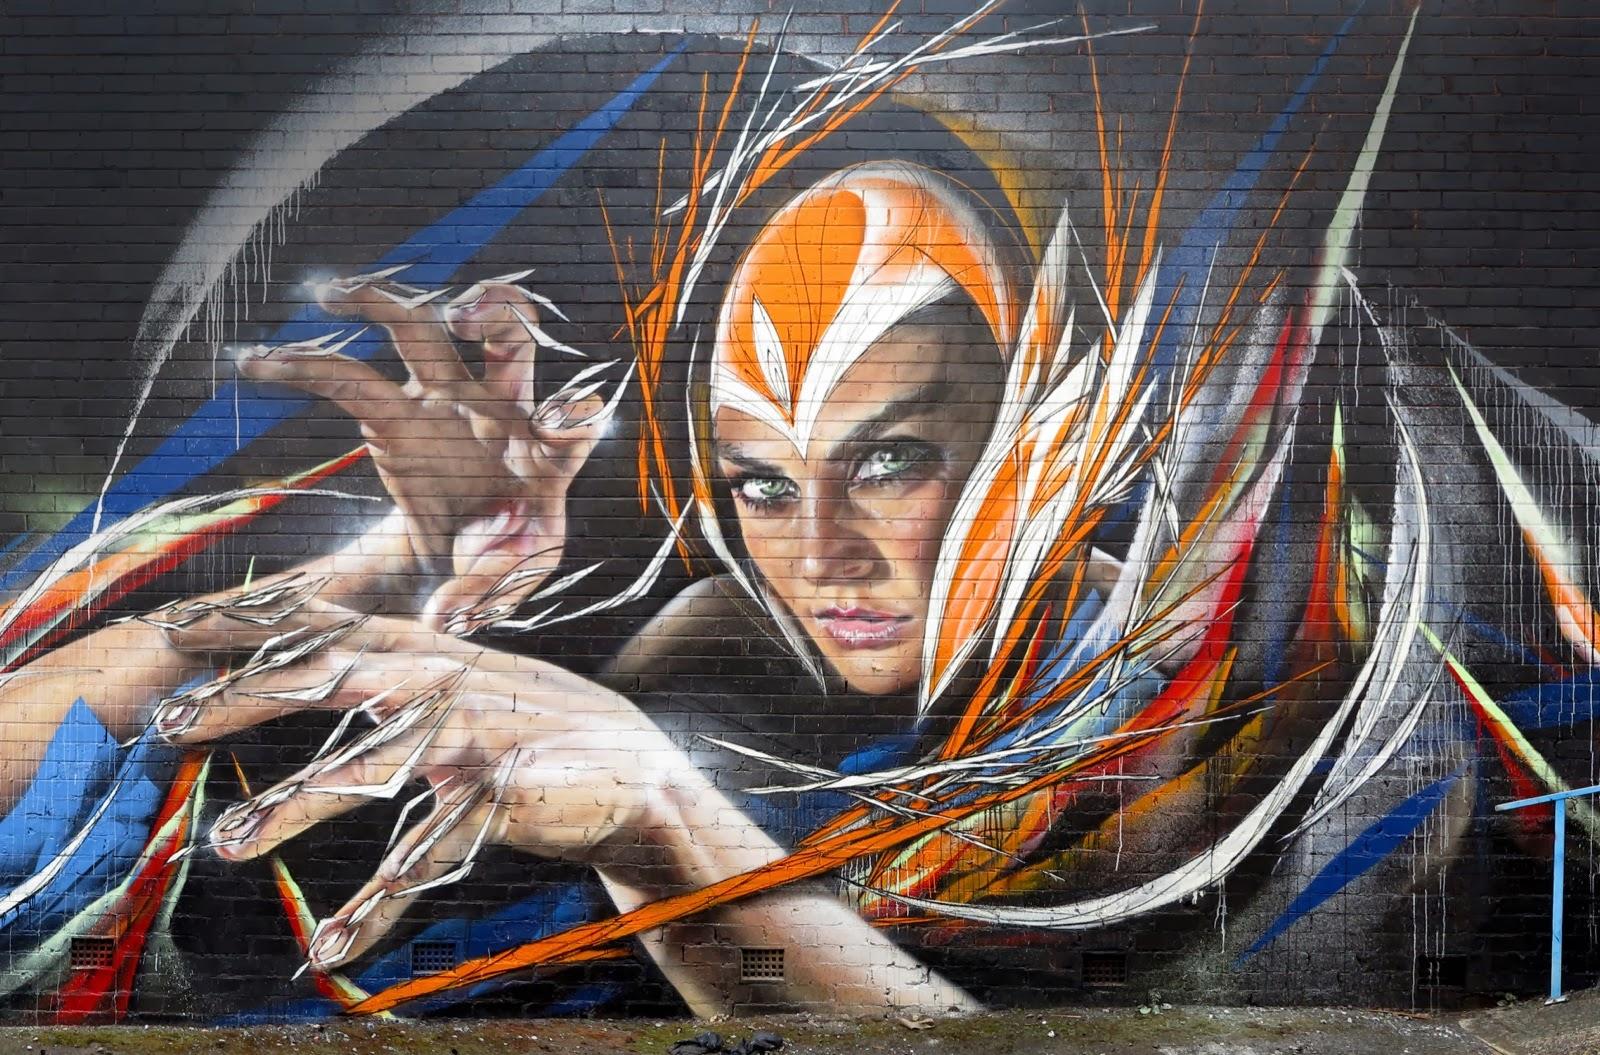 Adnate x shida new mural wollongong australia for Australian mural artists